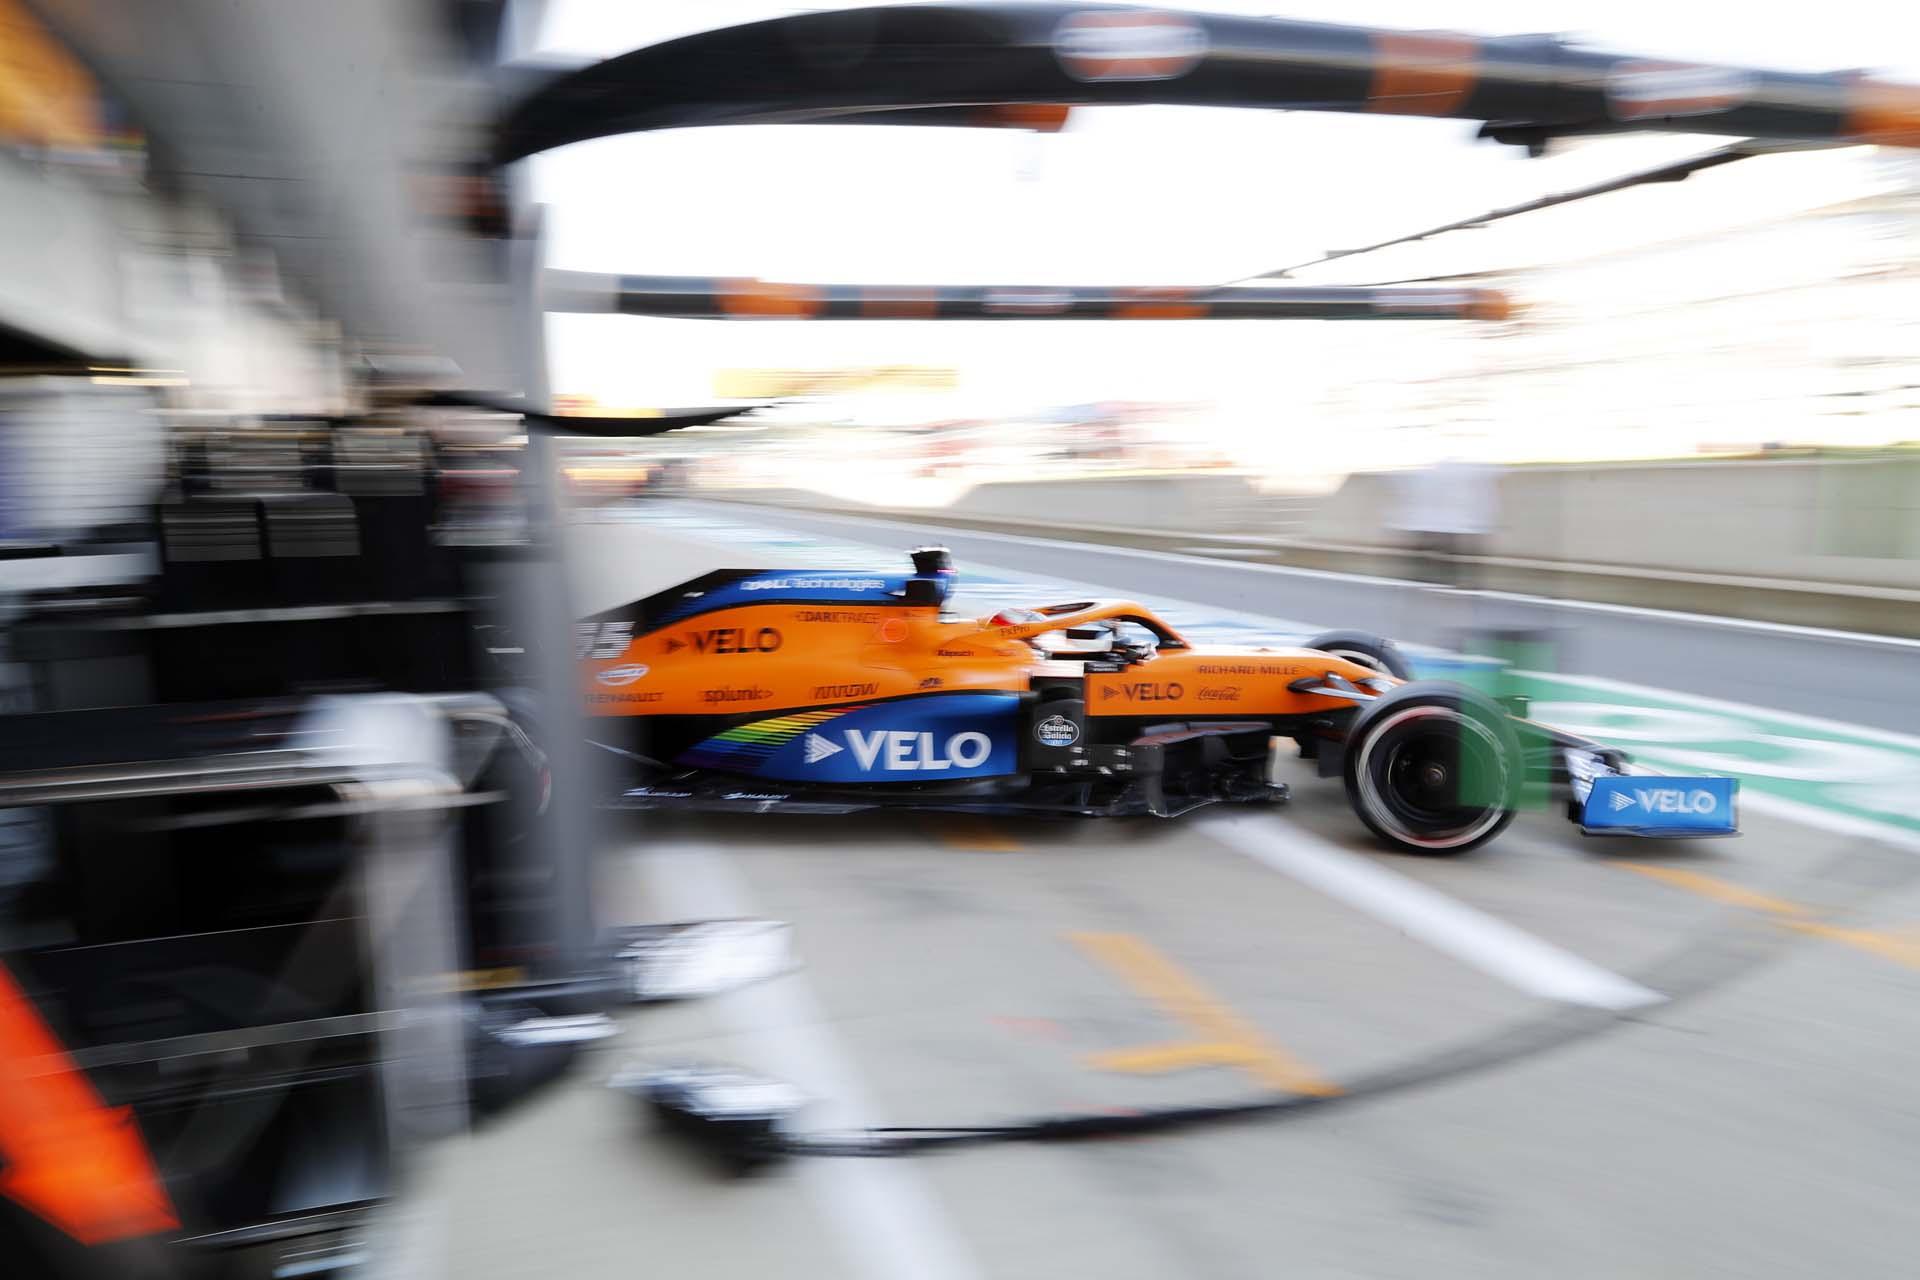 Carlos Sainz, McLaren MCL35, leaves the garage